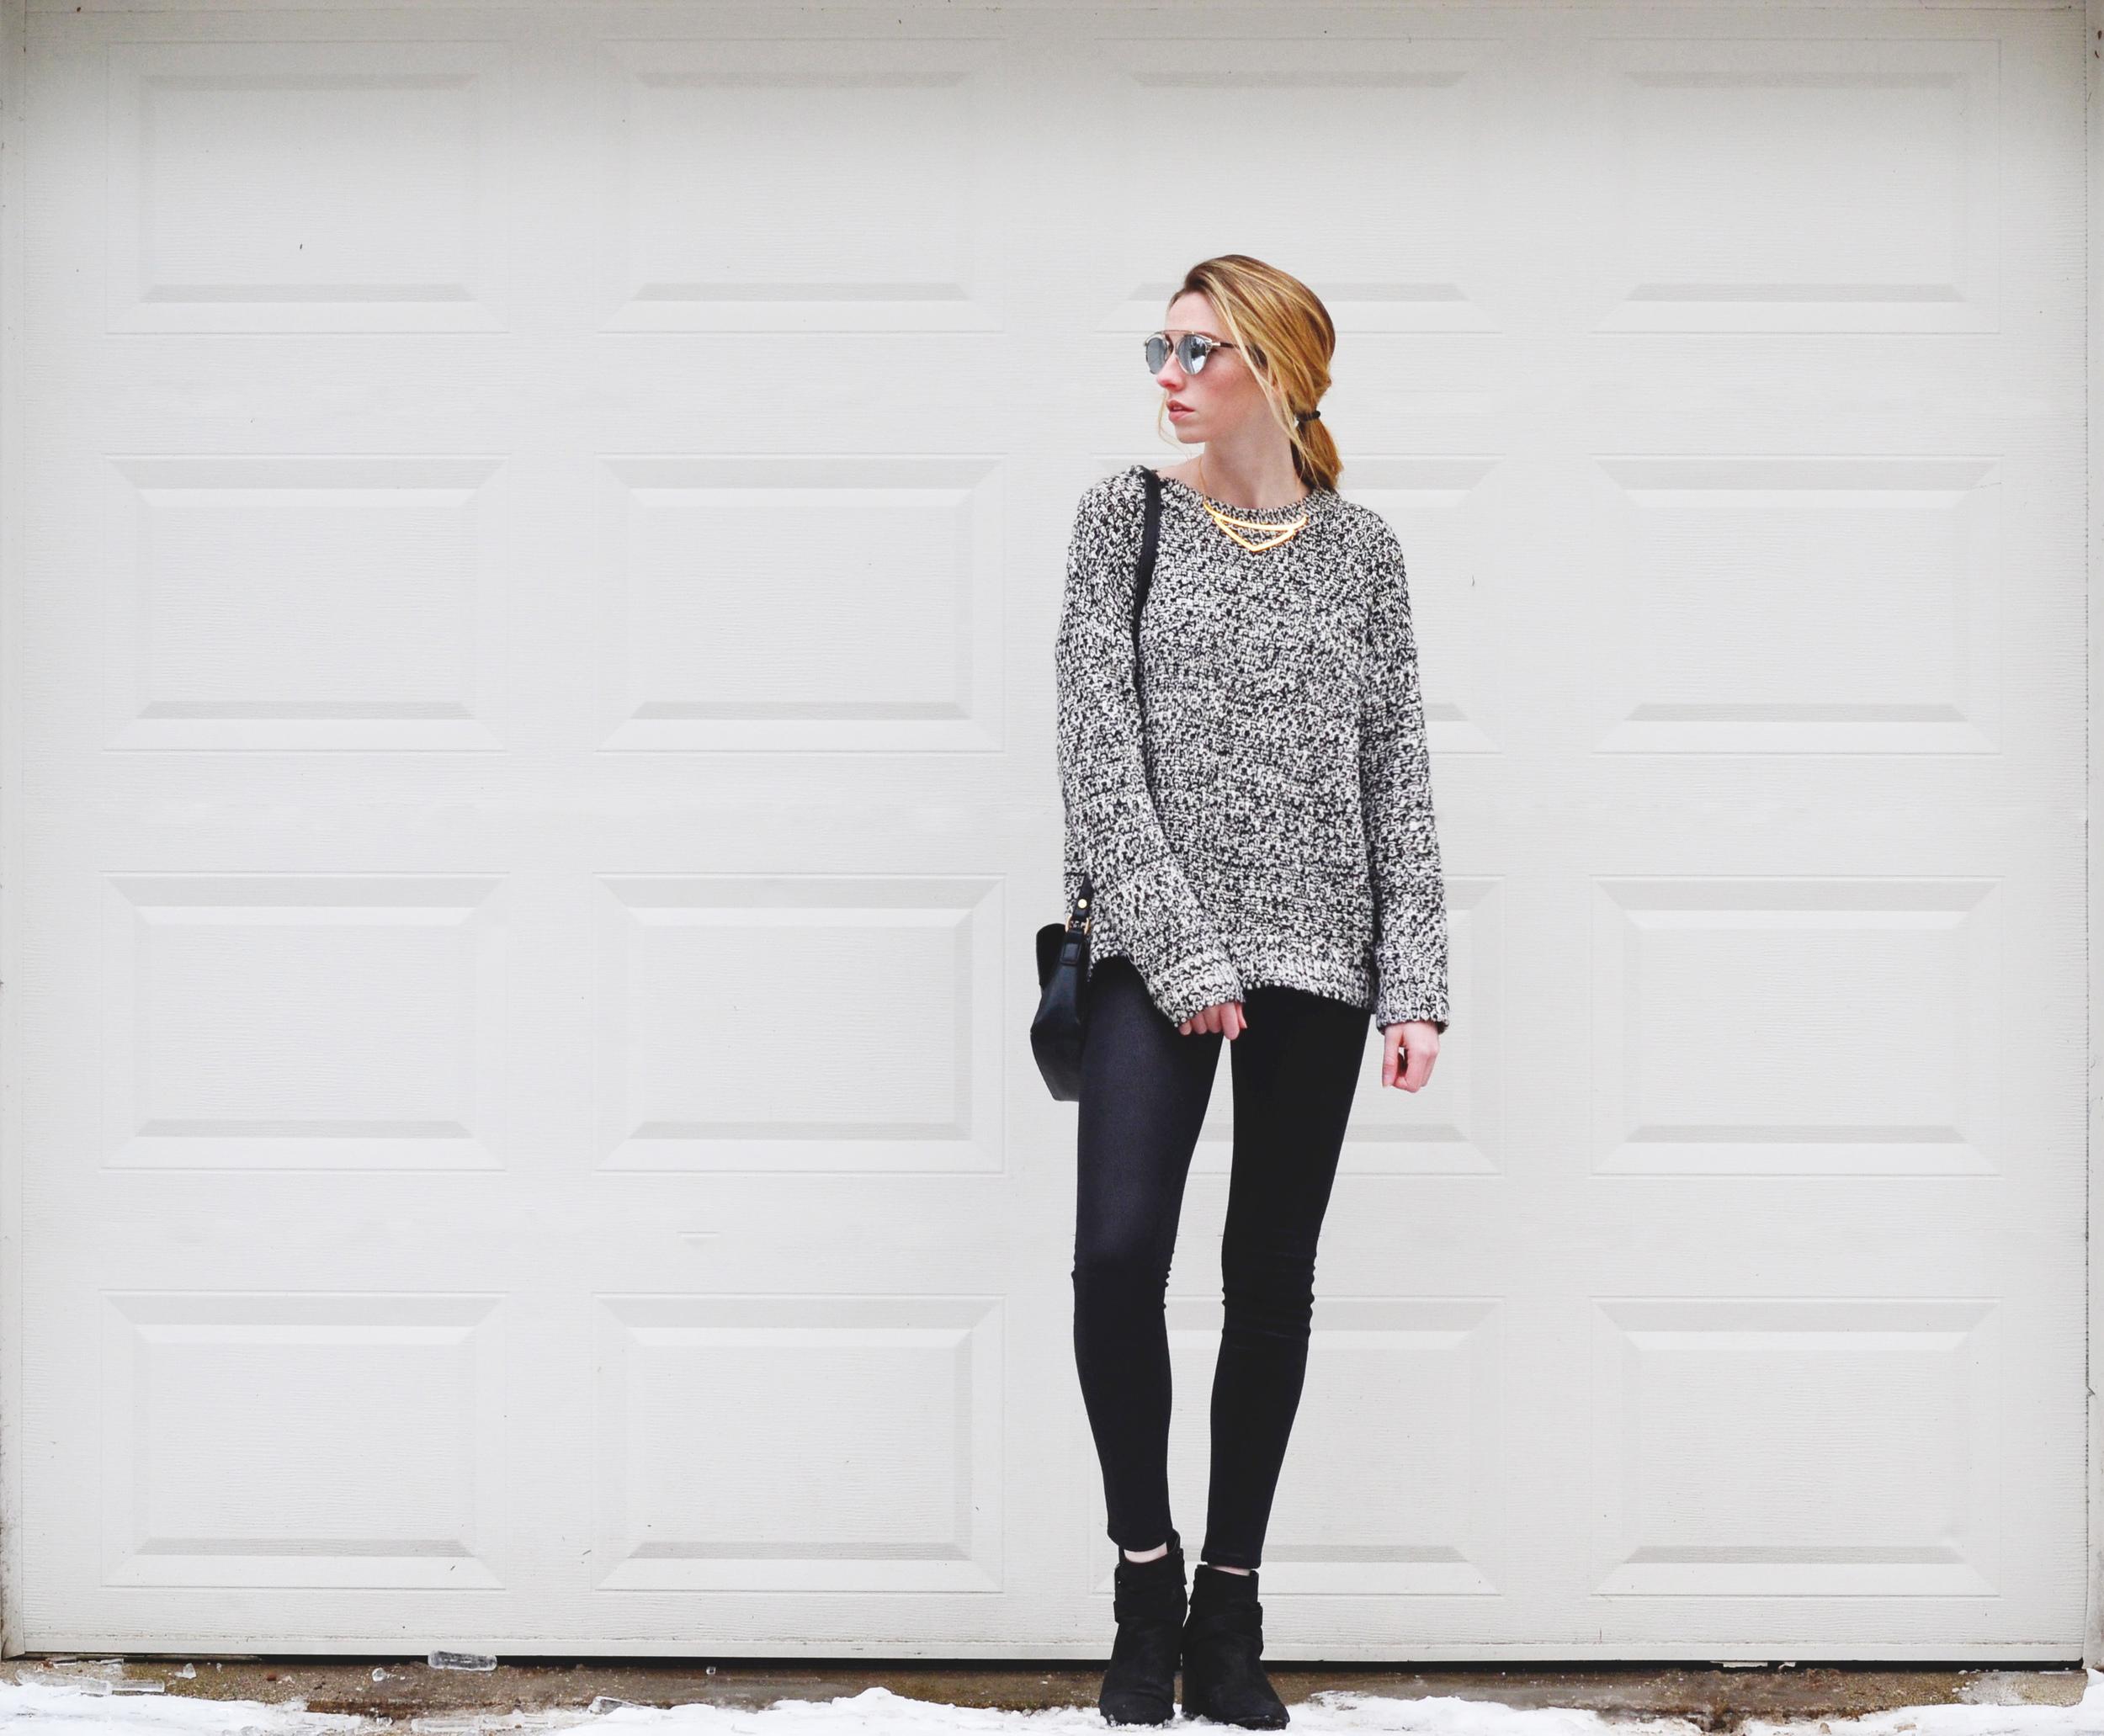 Marled Knit (via Girl x Garment)